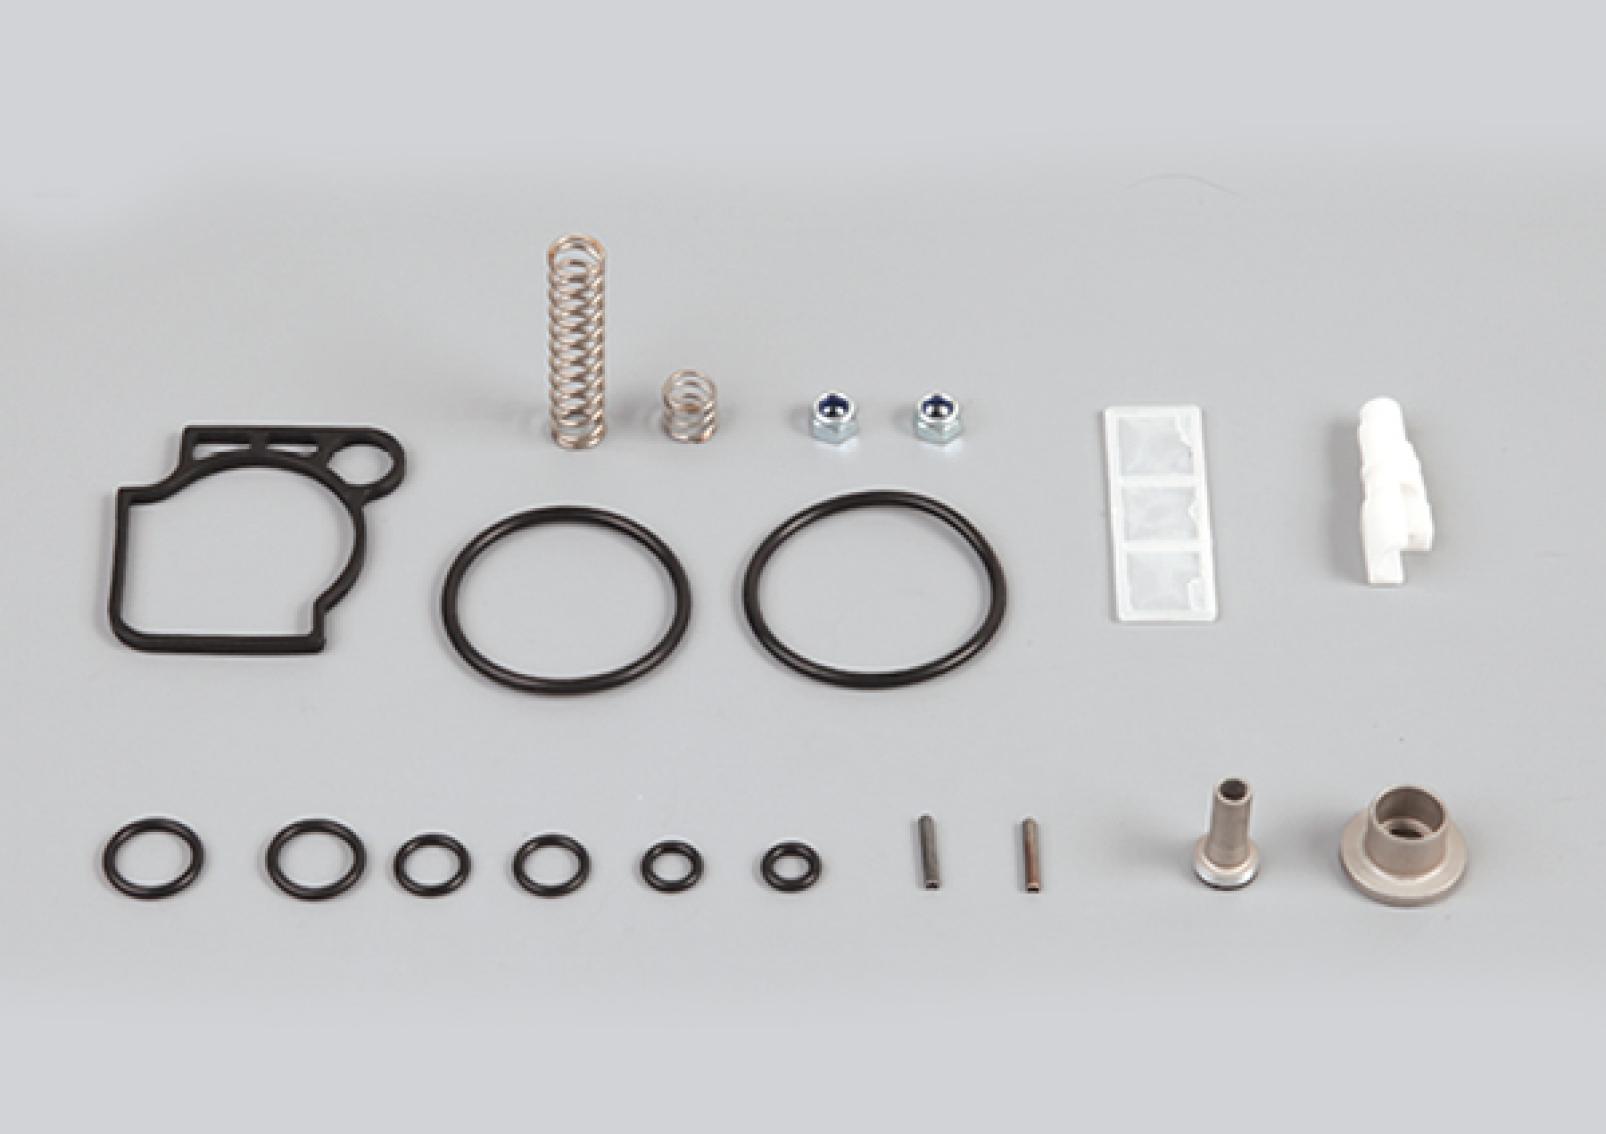 Hand Brake Valve Repair Kit, 961 723 000 2